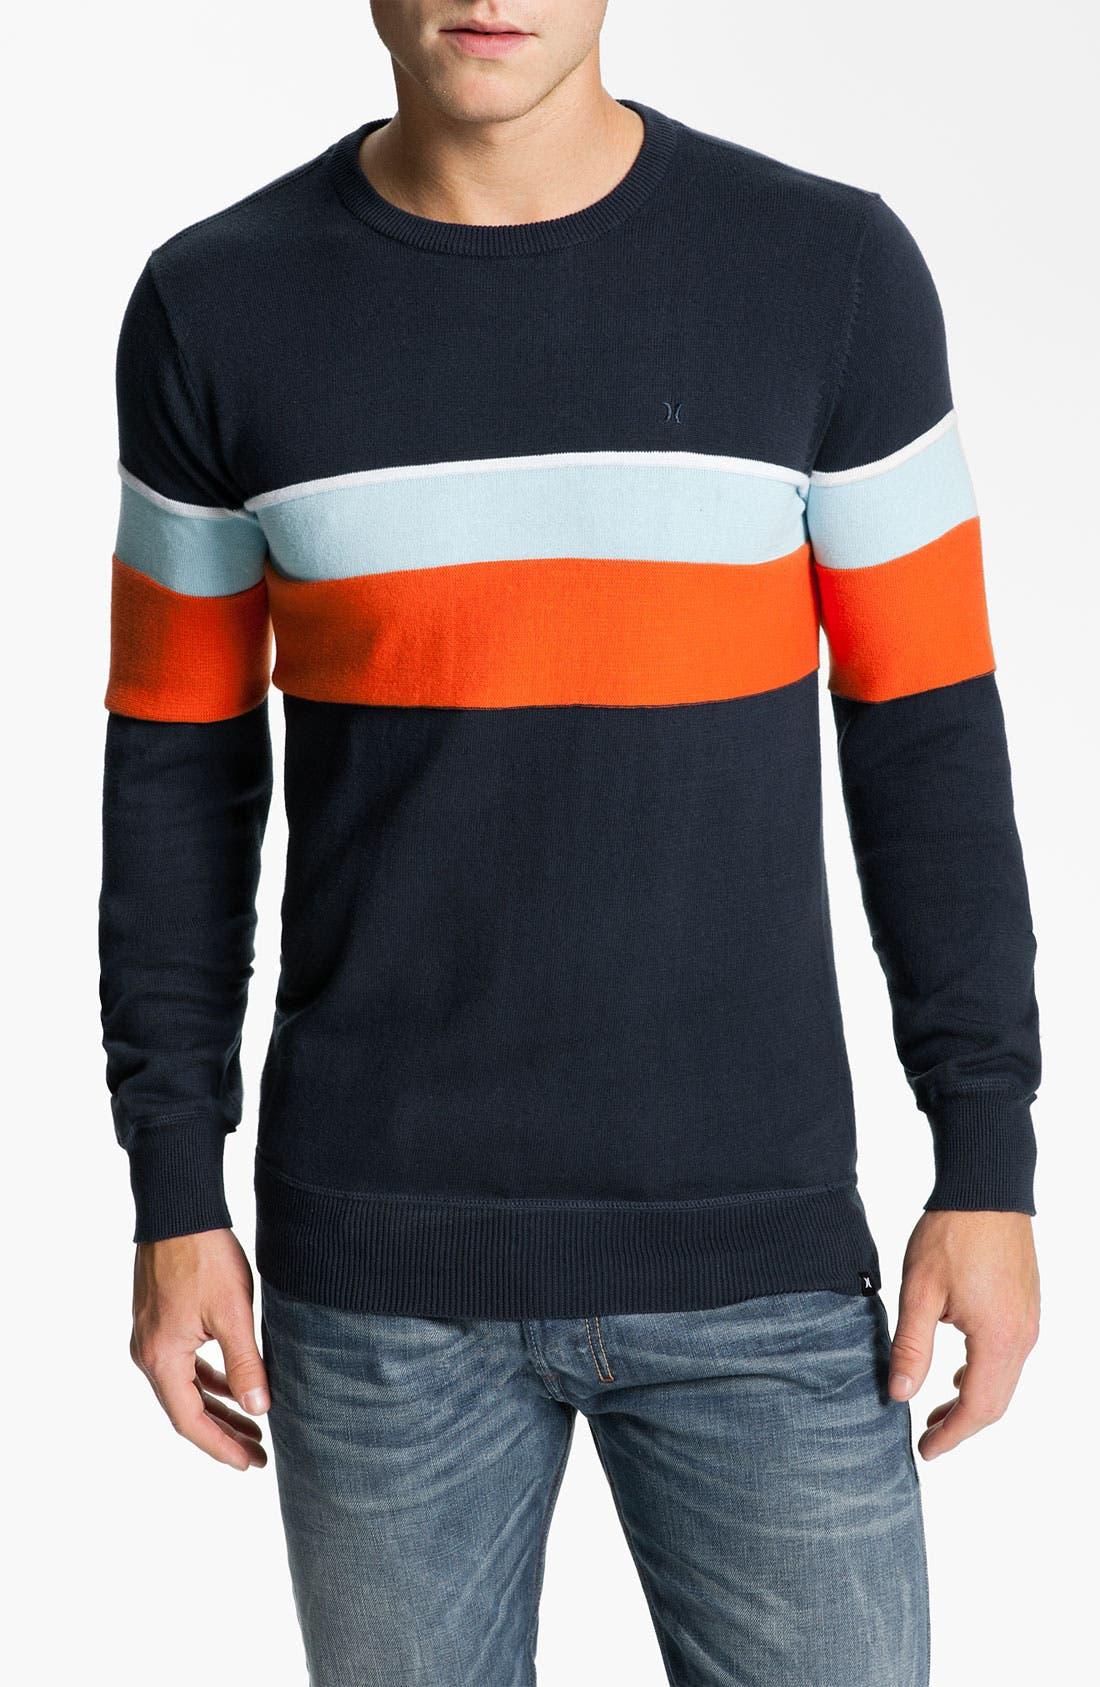 Main Image - Hurley 'Hanger' Stripe Crewneck Sweater